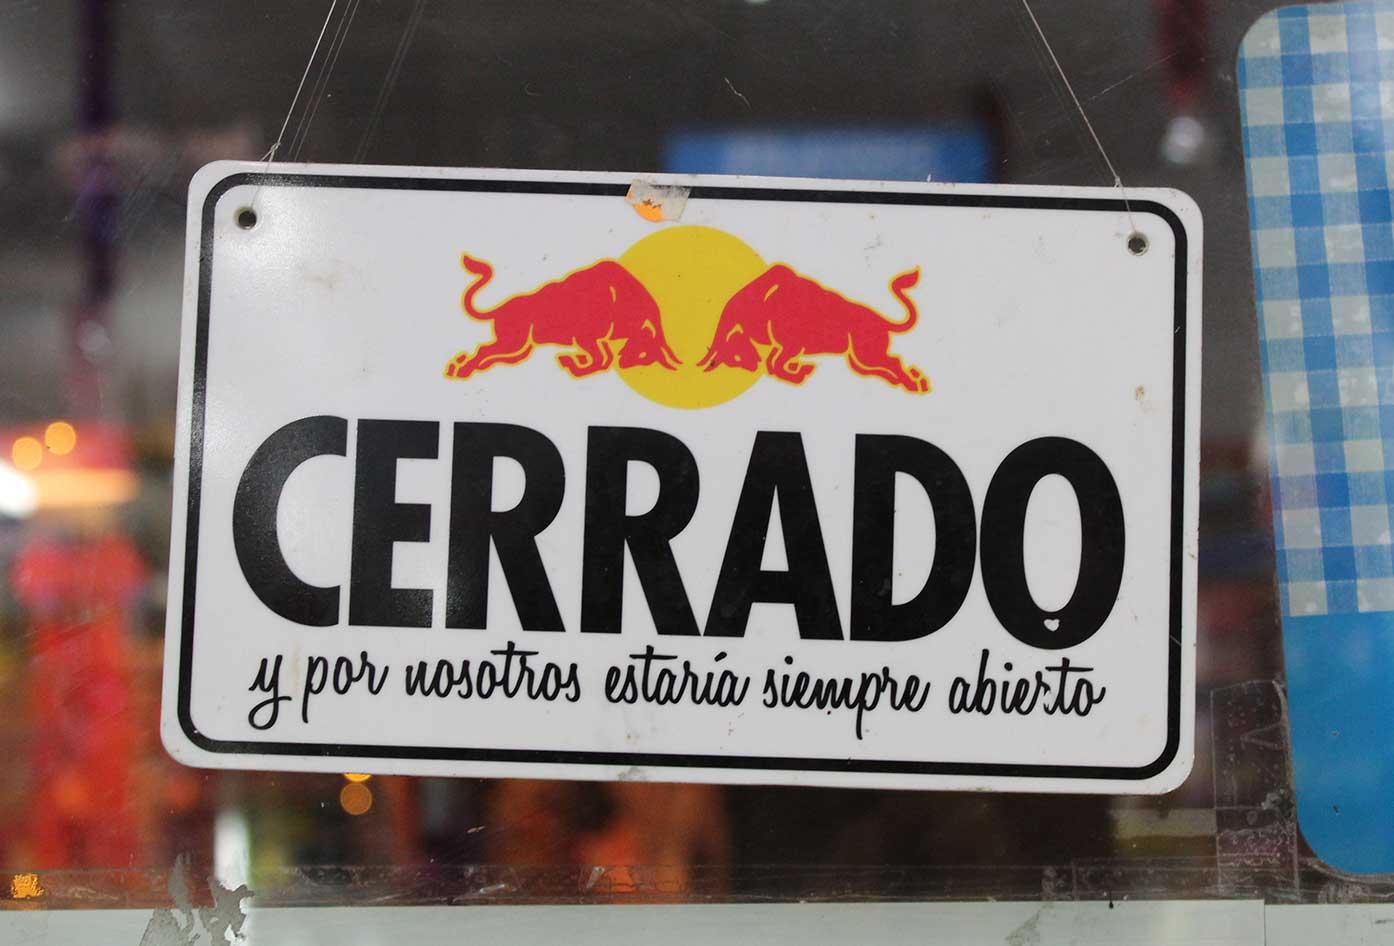 closed in spanish sign